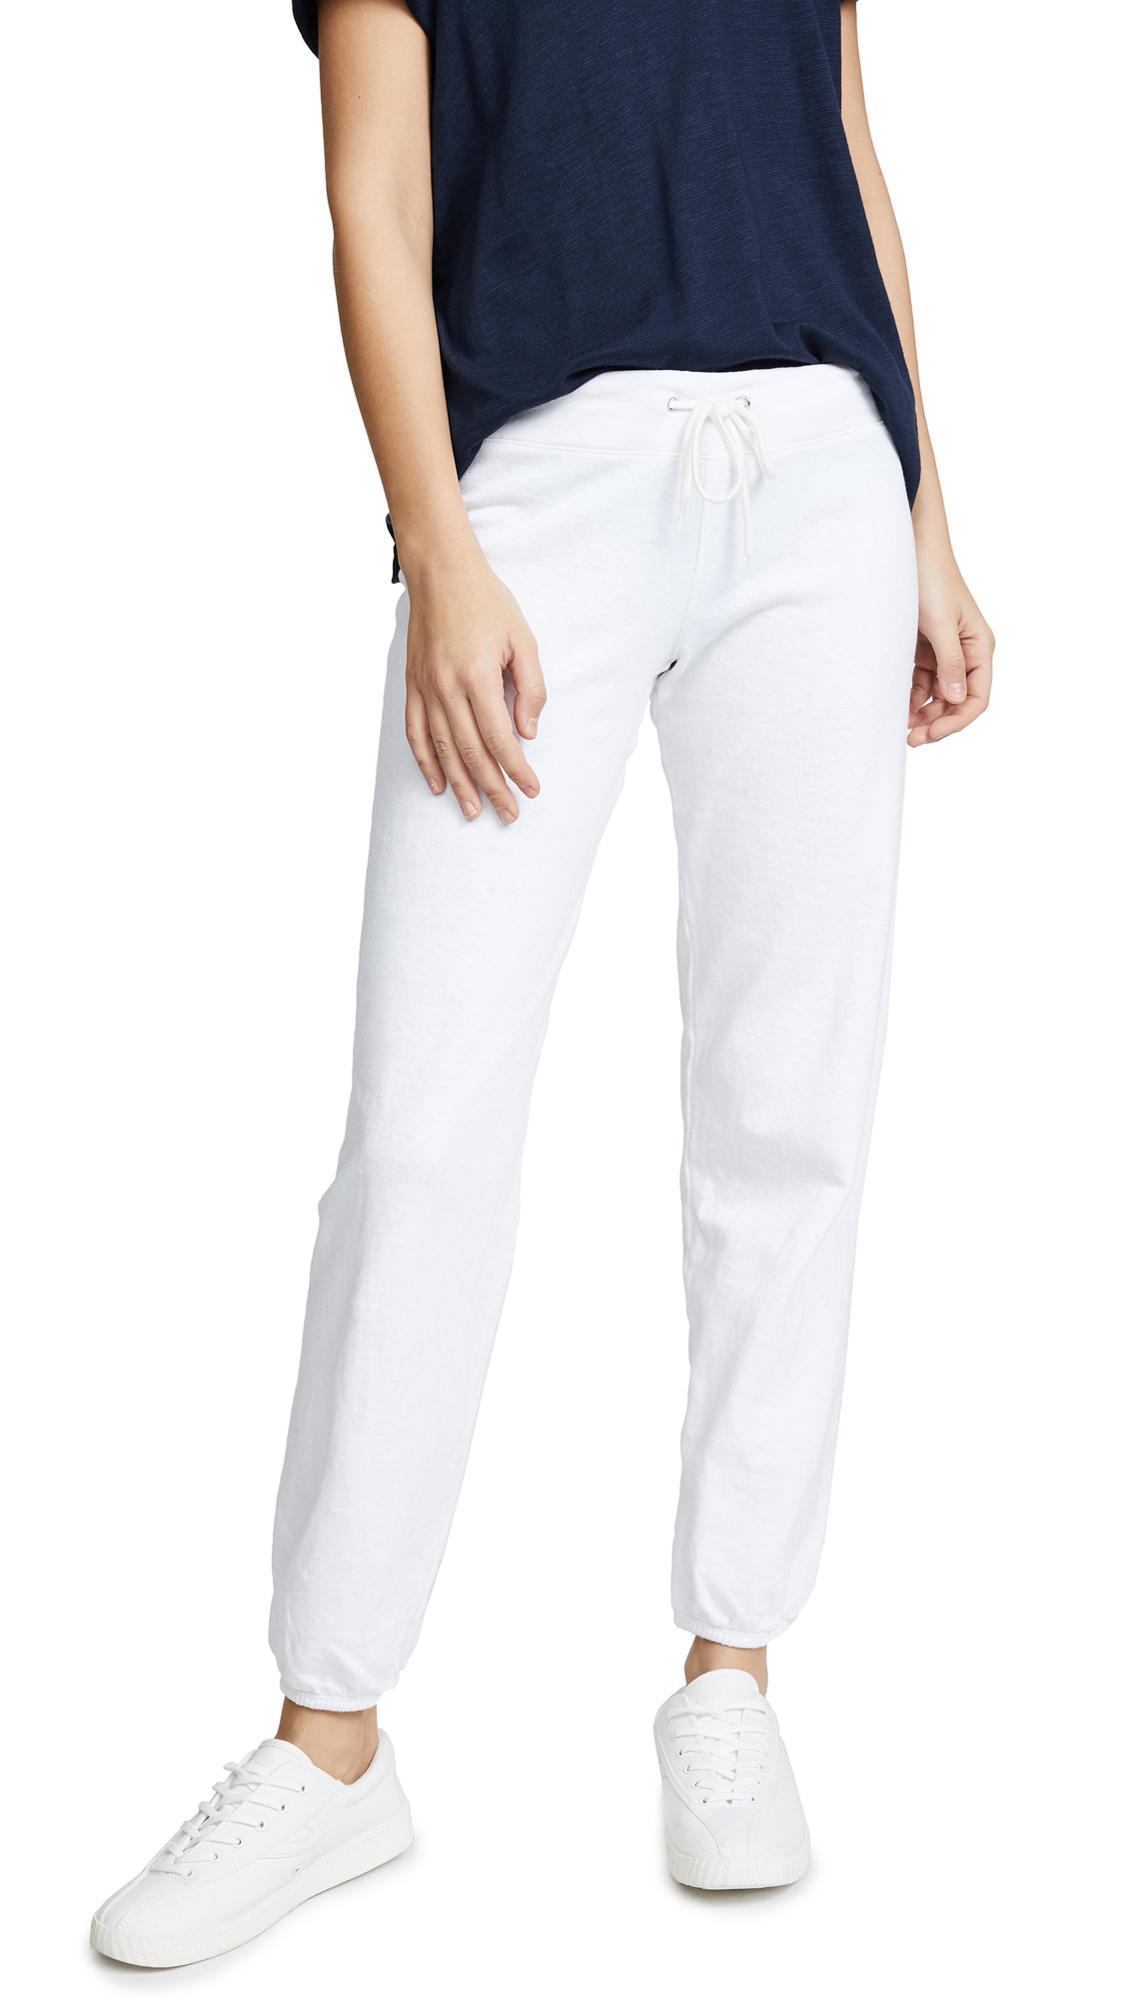 MONROW Vintage Sweatpants - White